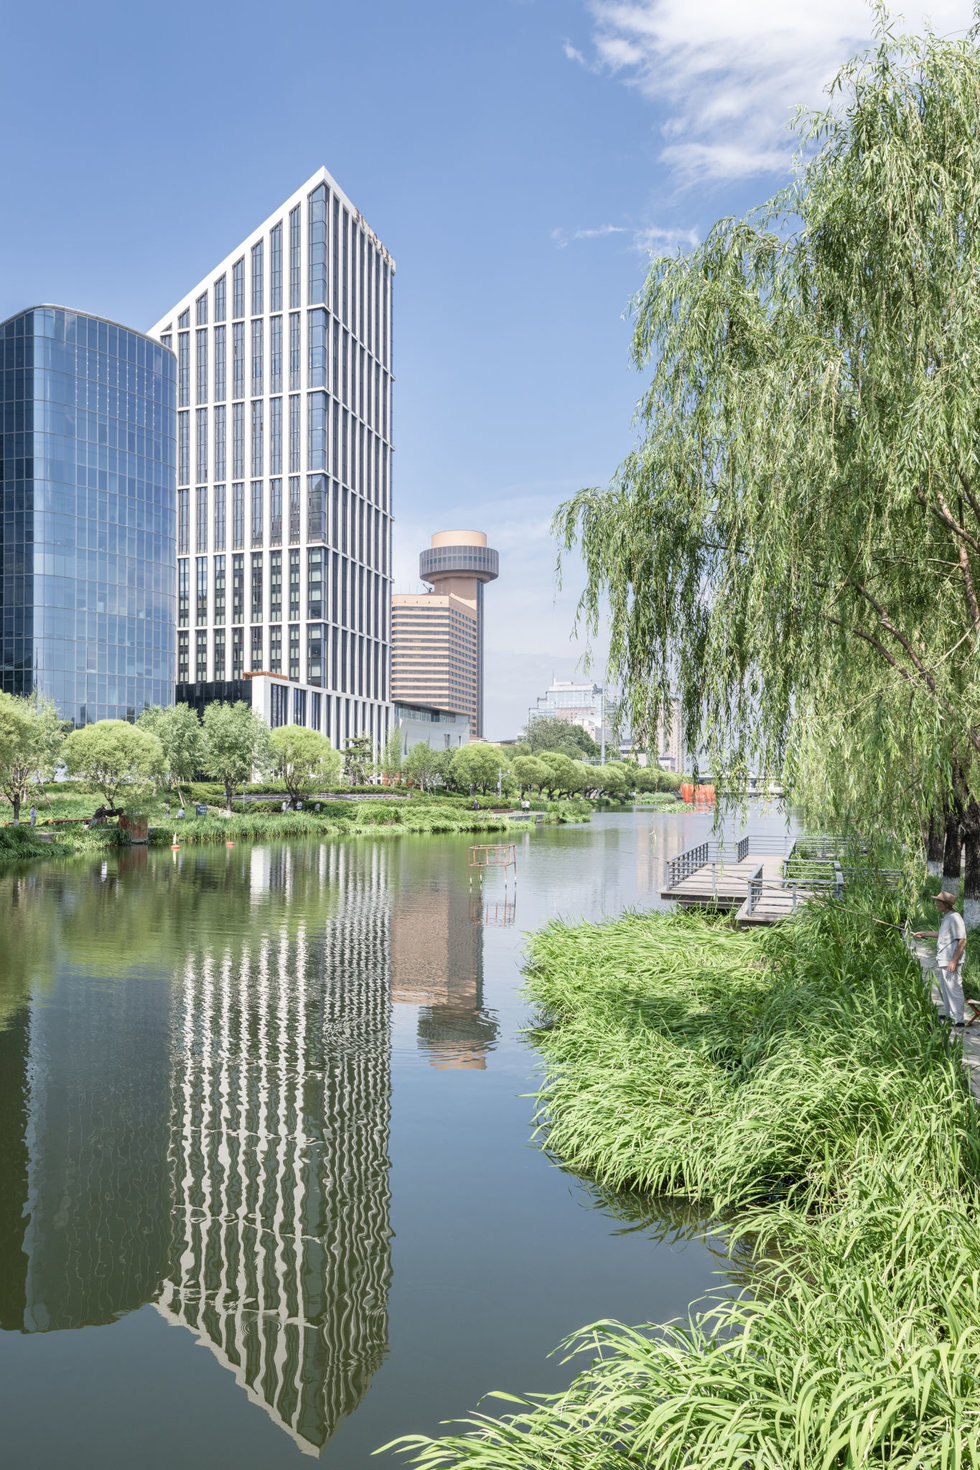 Modern towers along the Landmark River